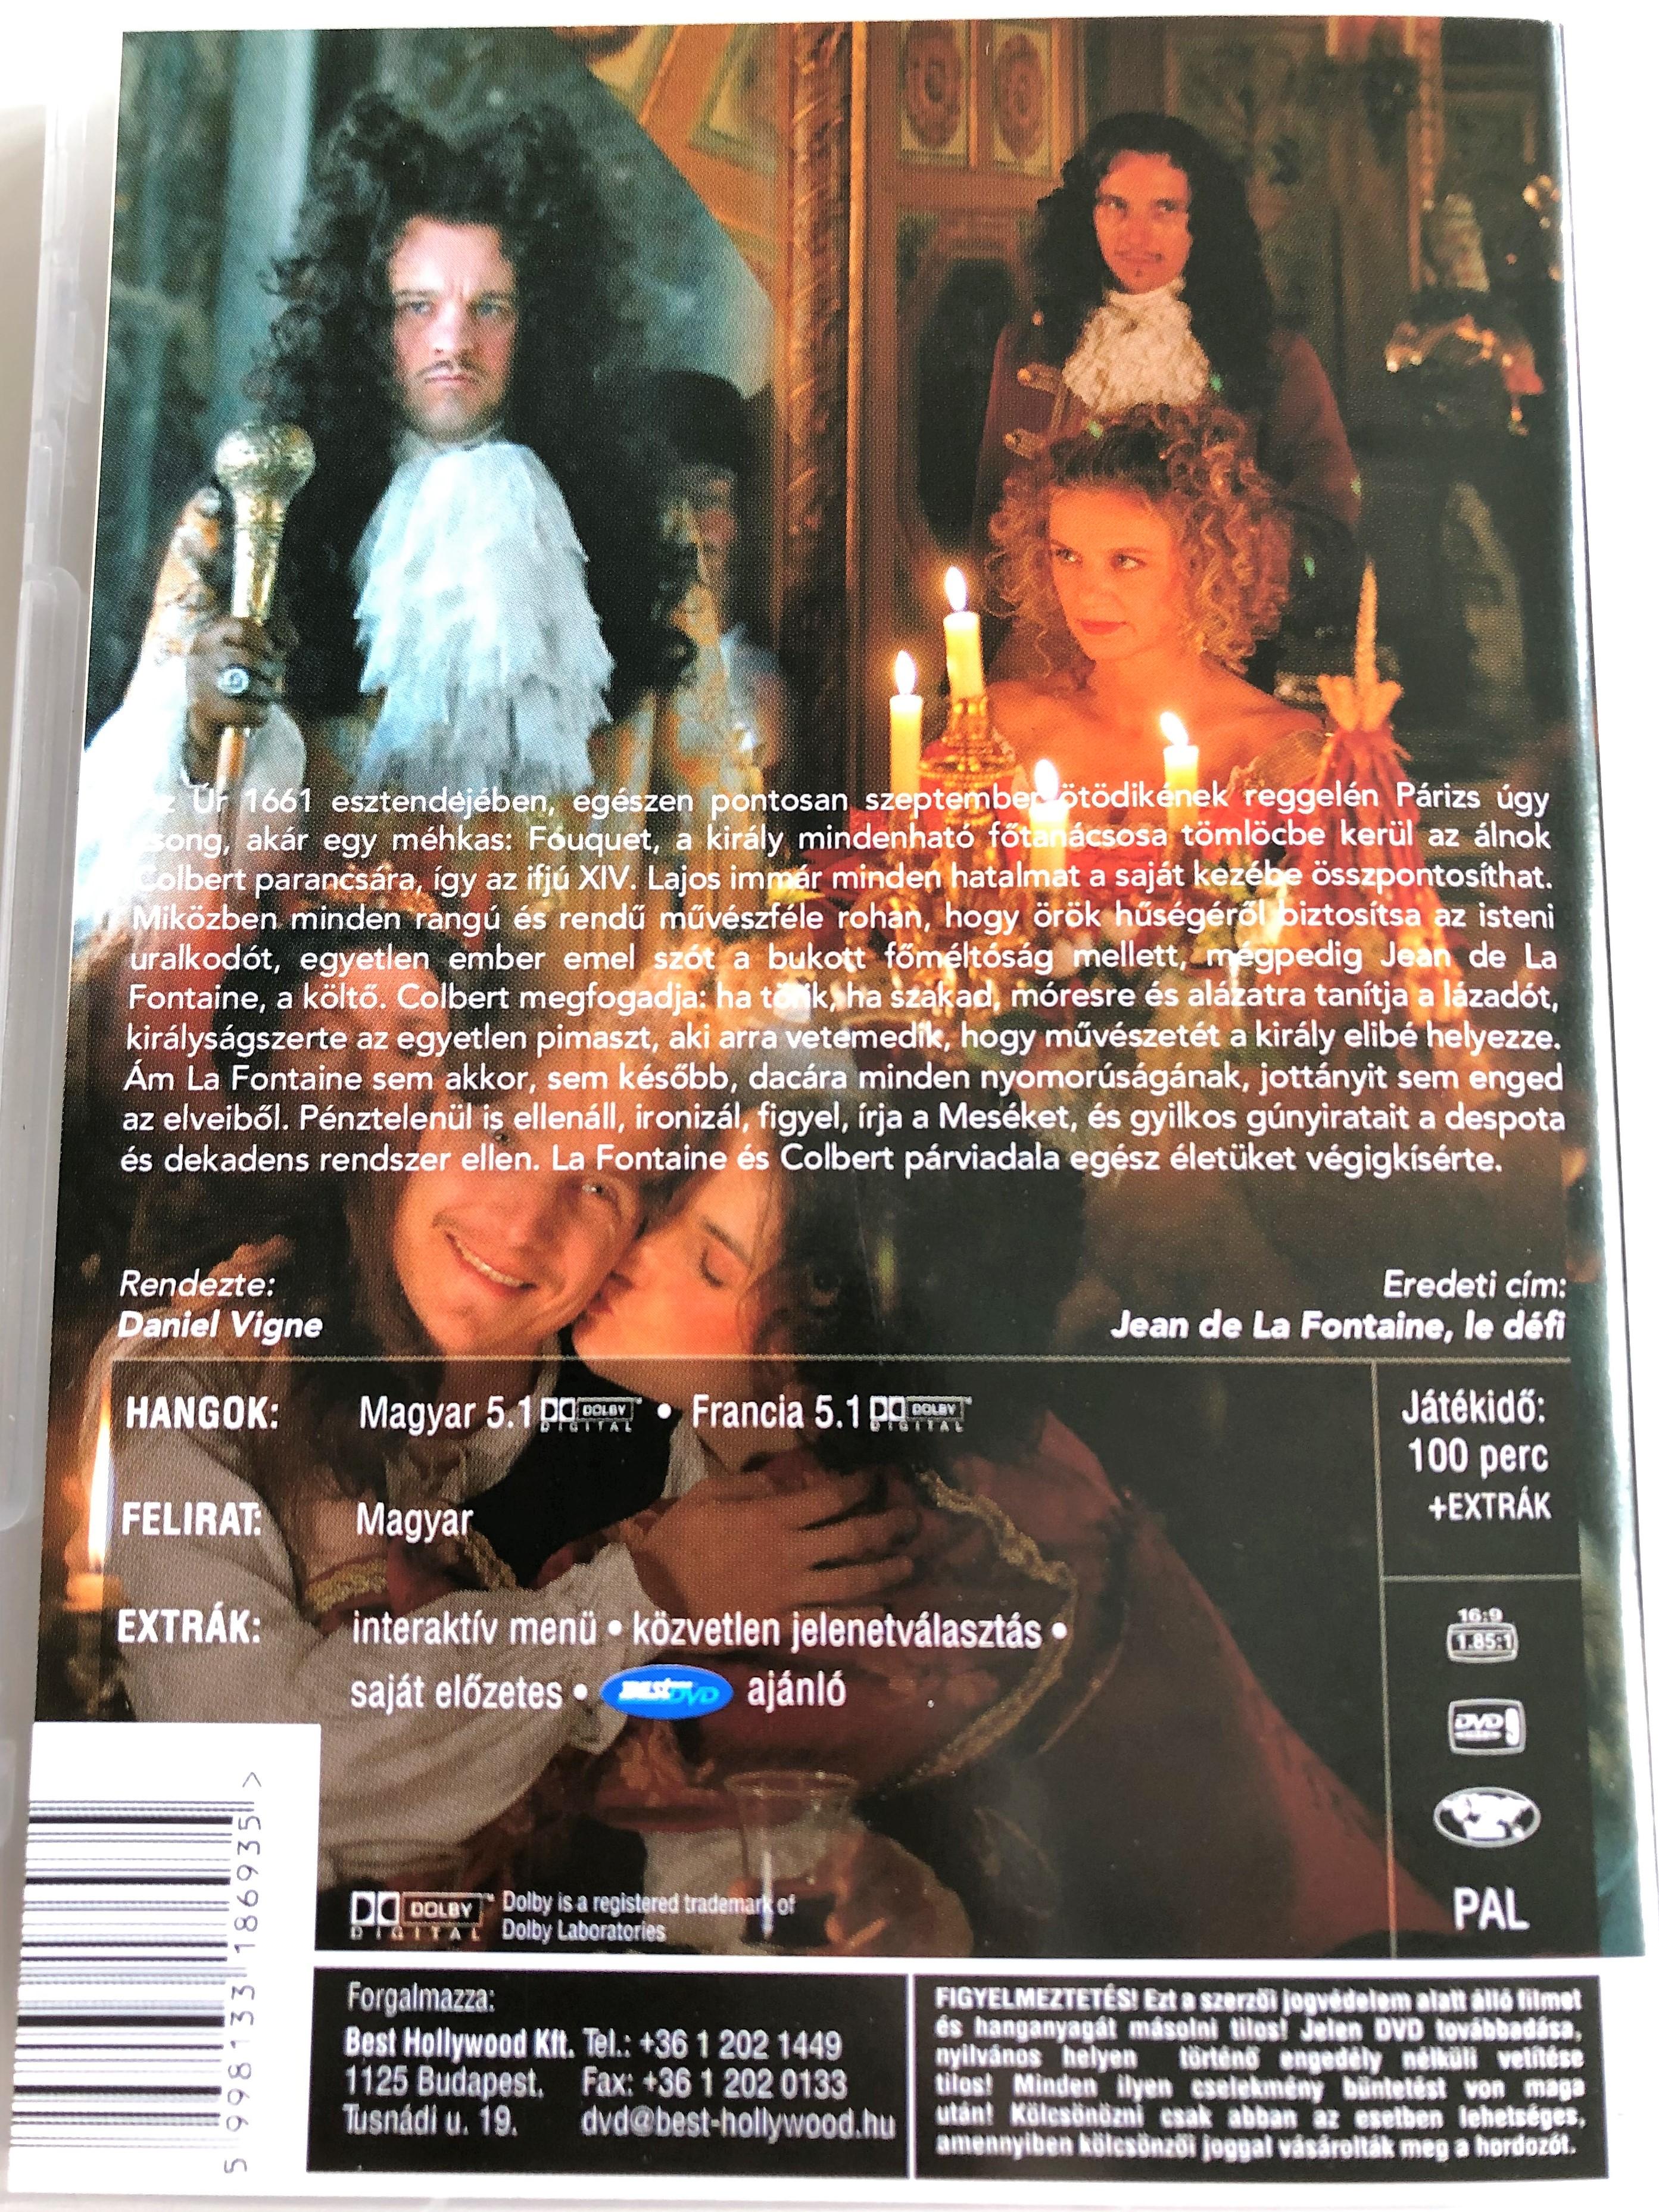 jean-de-la-fontaine-le-d-fi-dvd-2007-la-fontaine-a-mesemond-directed-by-daniel-vigne-starring-lor-nt-deutsch-philippe-torreton-sara-forestier-3-.jpg